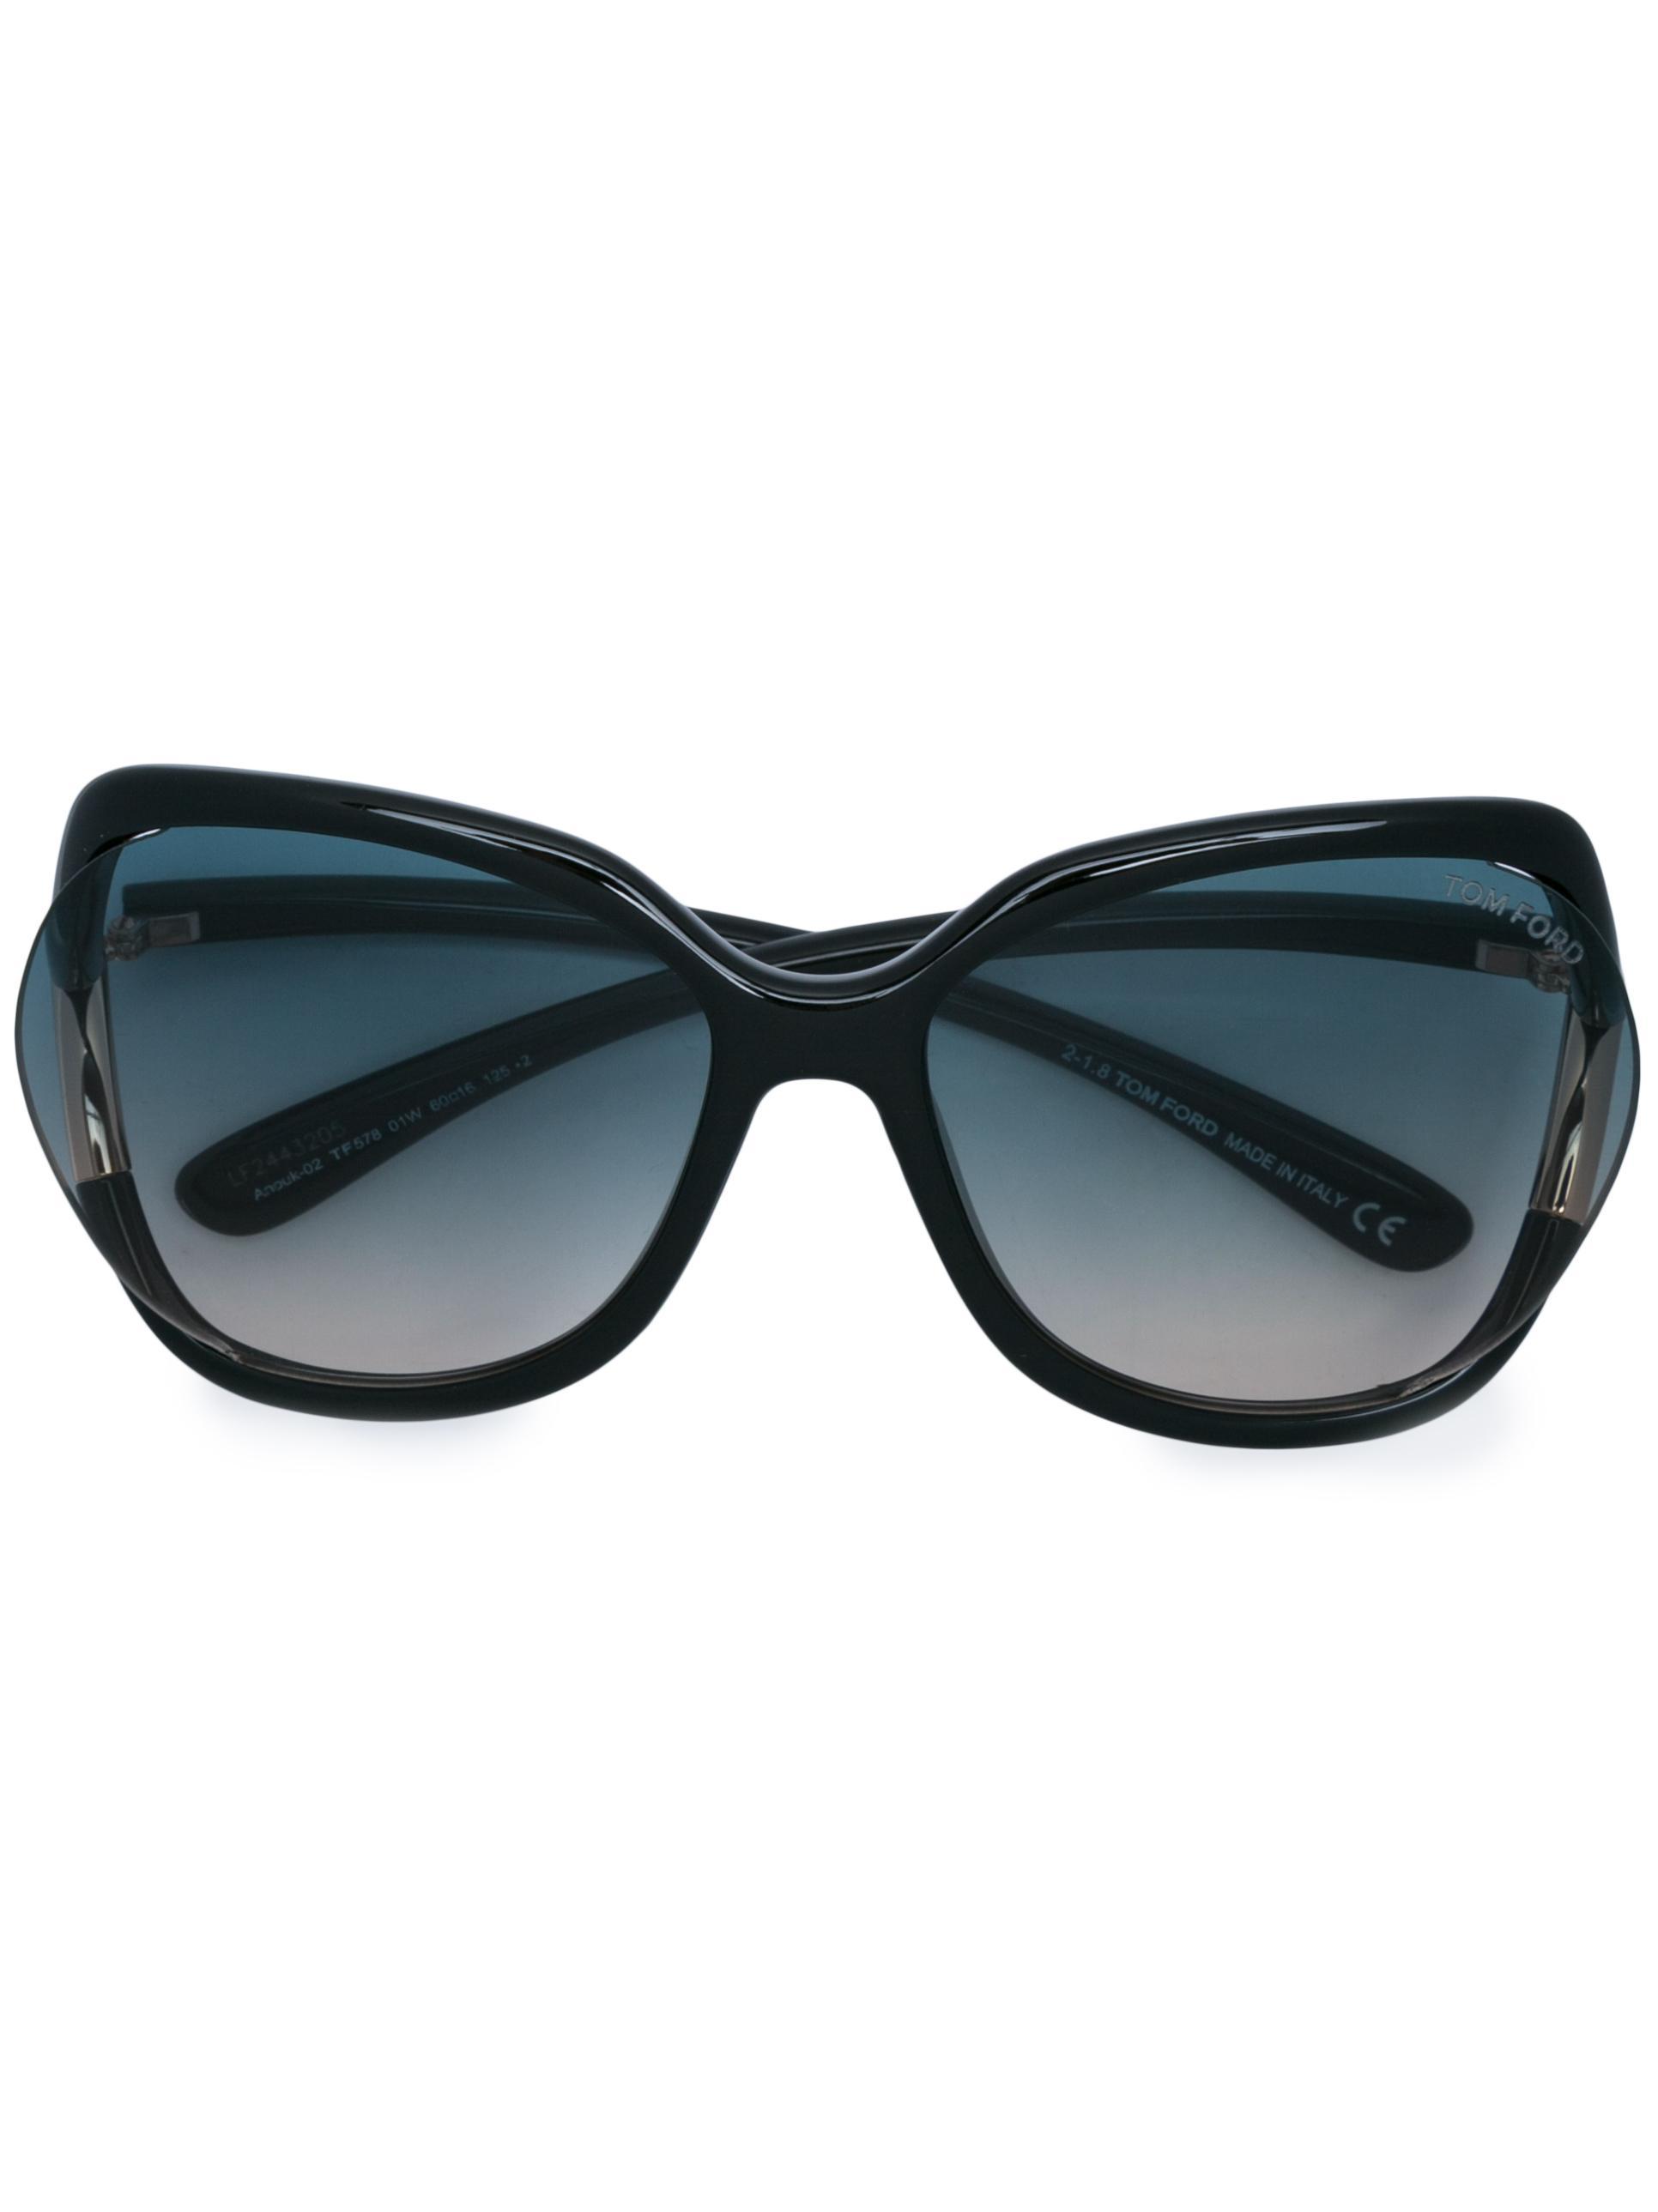 Anouk Oversized Sunglasses Item # FR0578-18